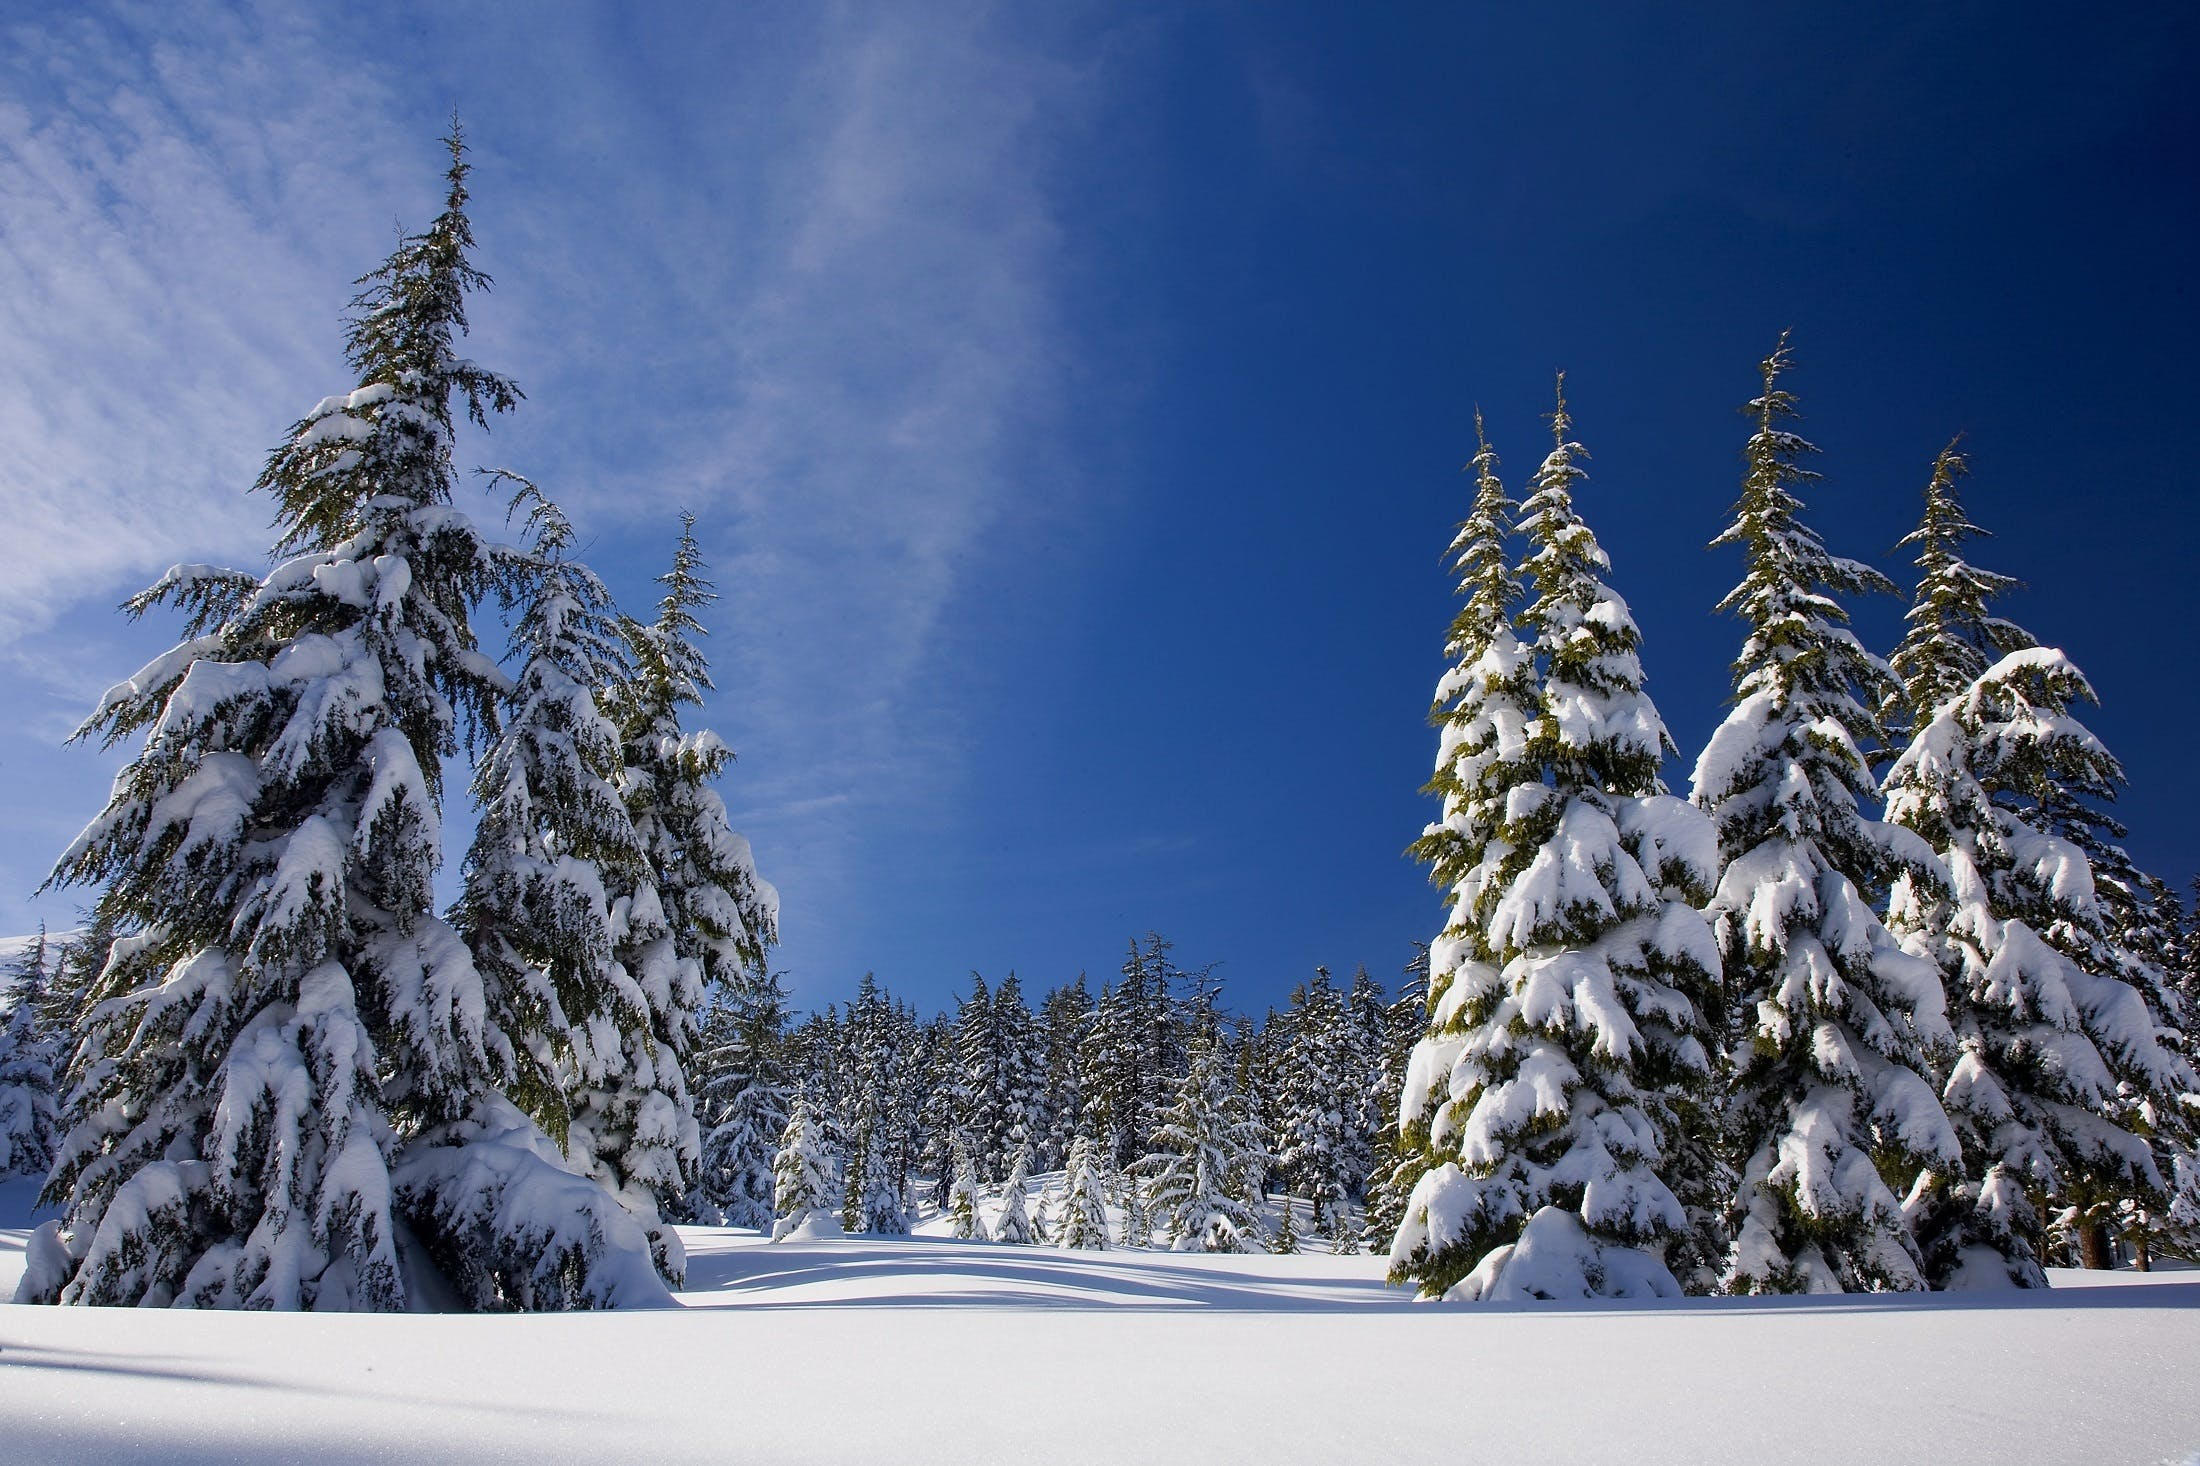 Kostenloses Stock Foto zu bäume, eis, himmel, holz